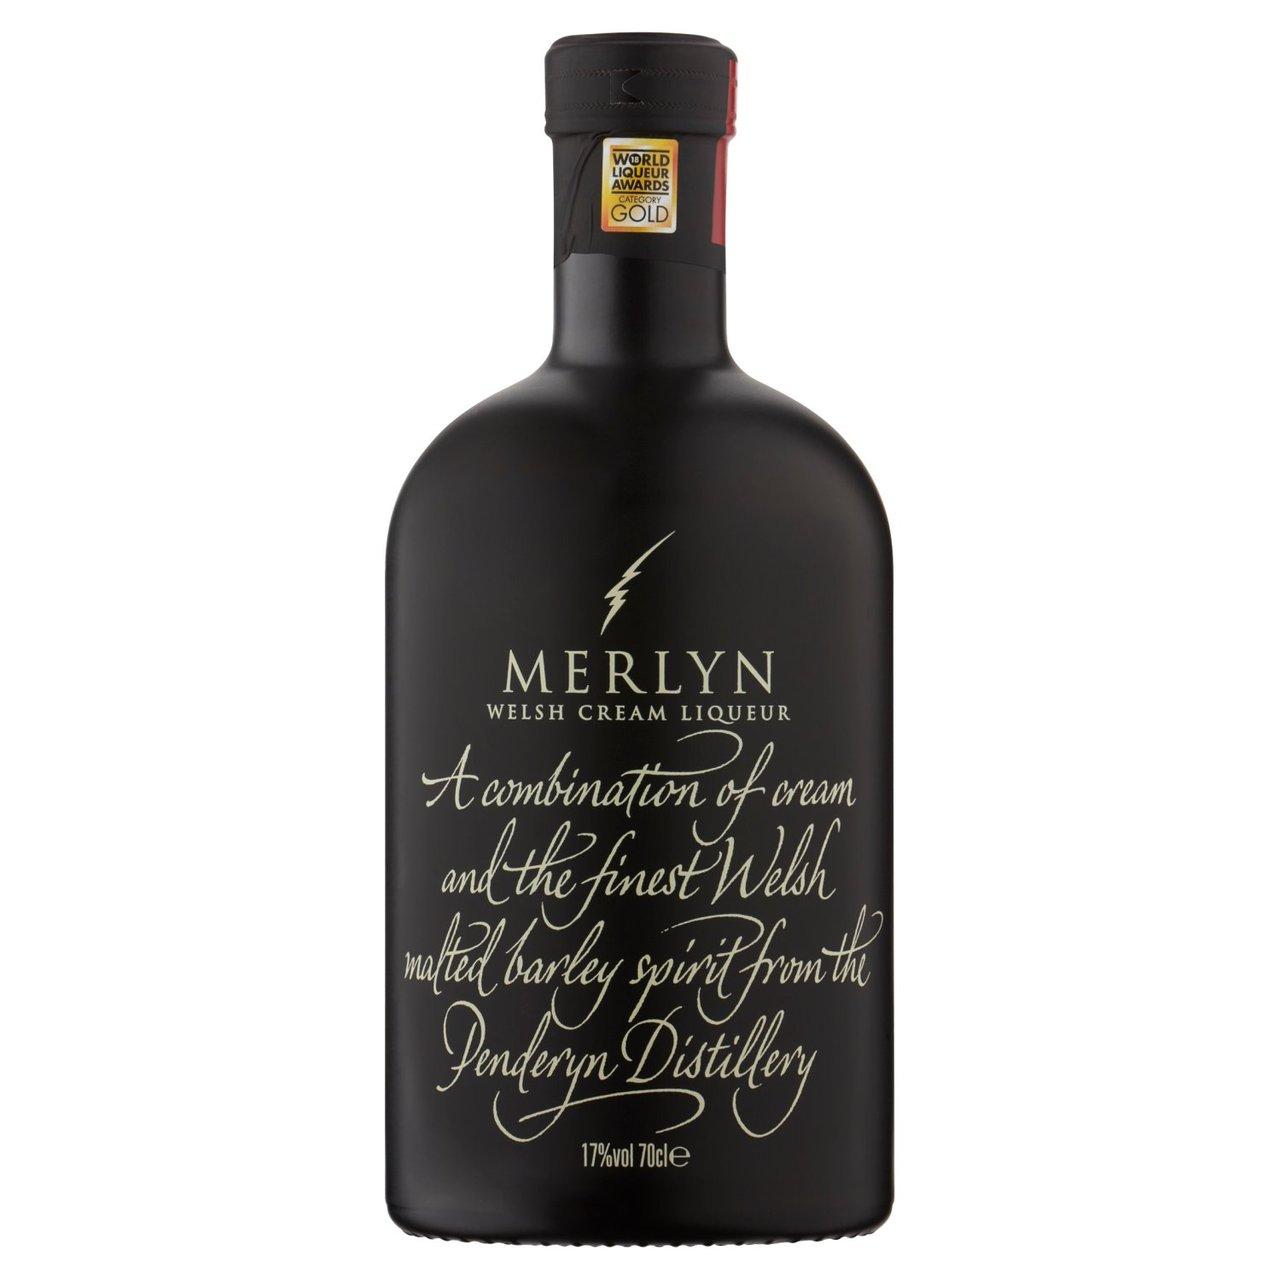 Merlyn Welsh Cream Liqueur 70cl - £10 @ Morrisons